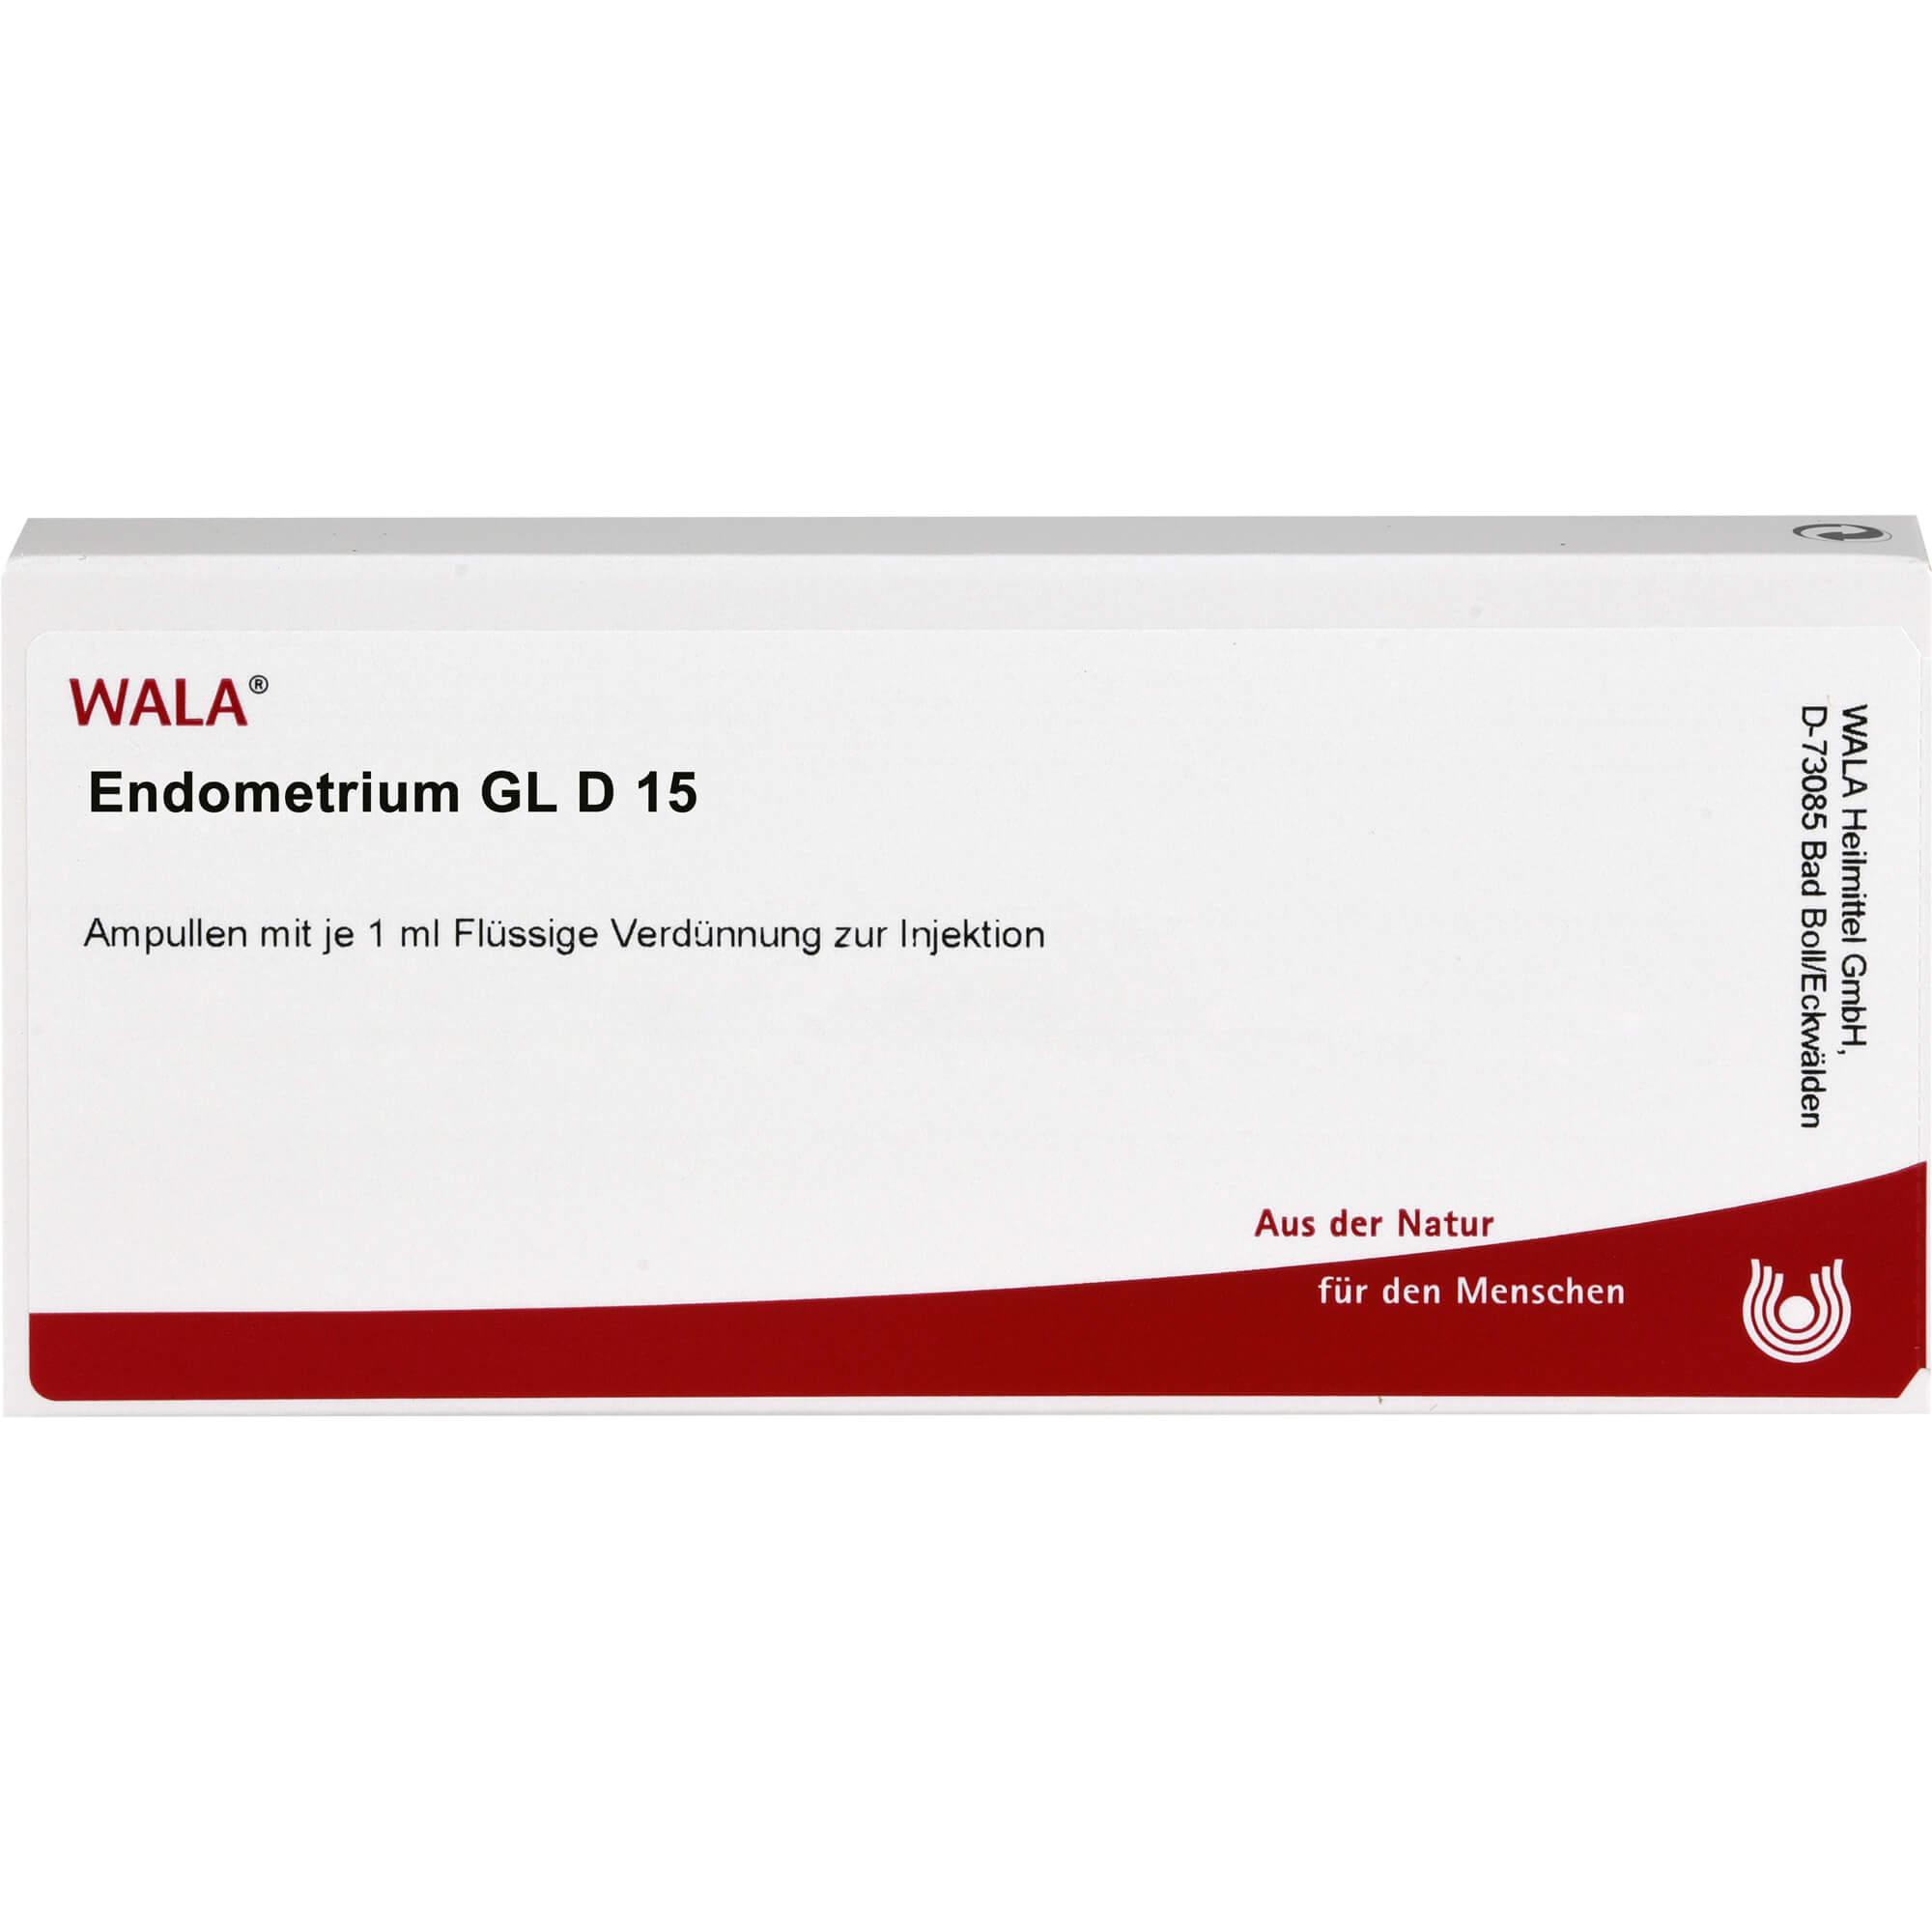 ENDOMETRIUM-GL-D-15-Ampullen